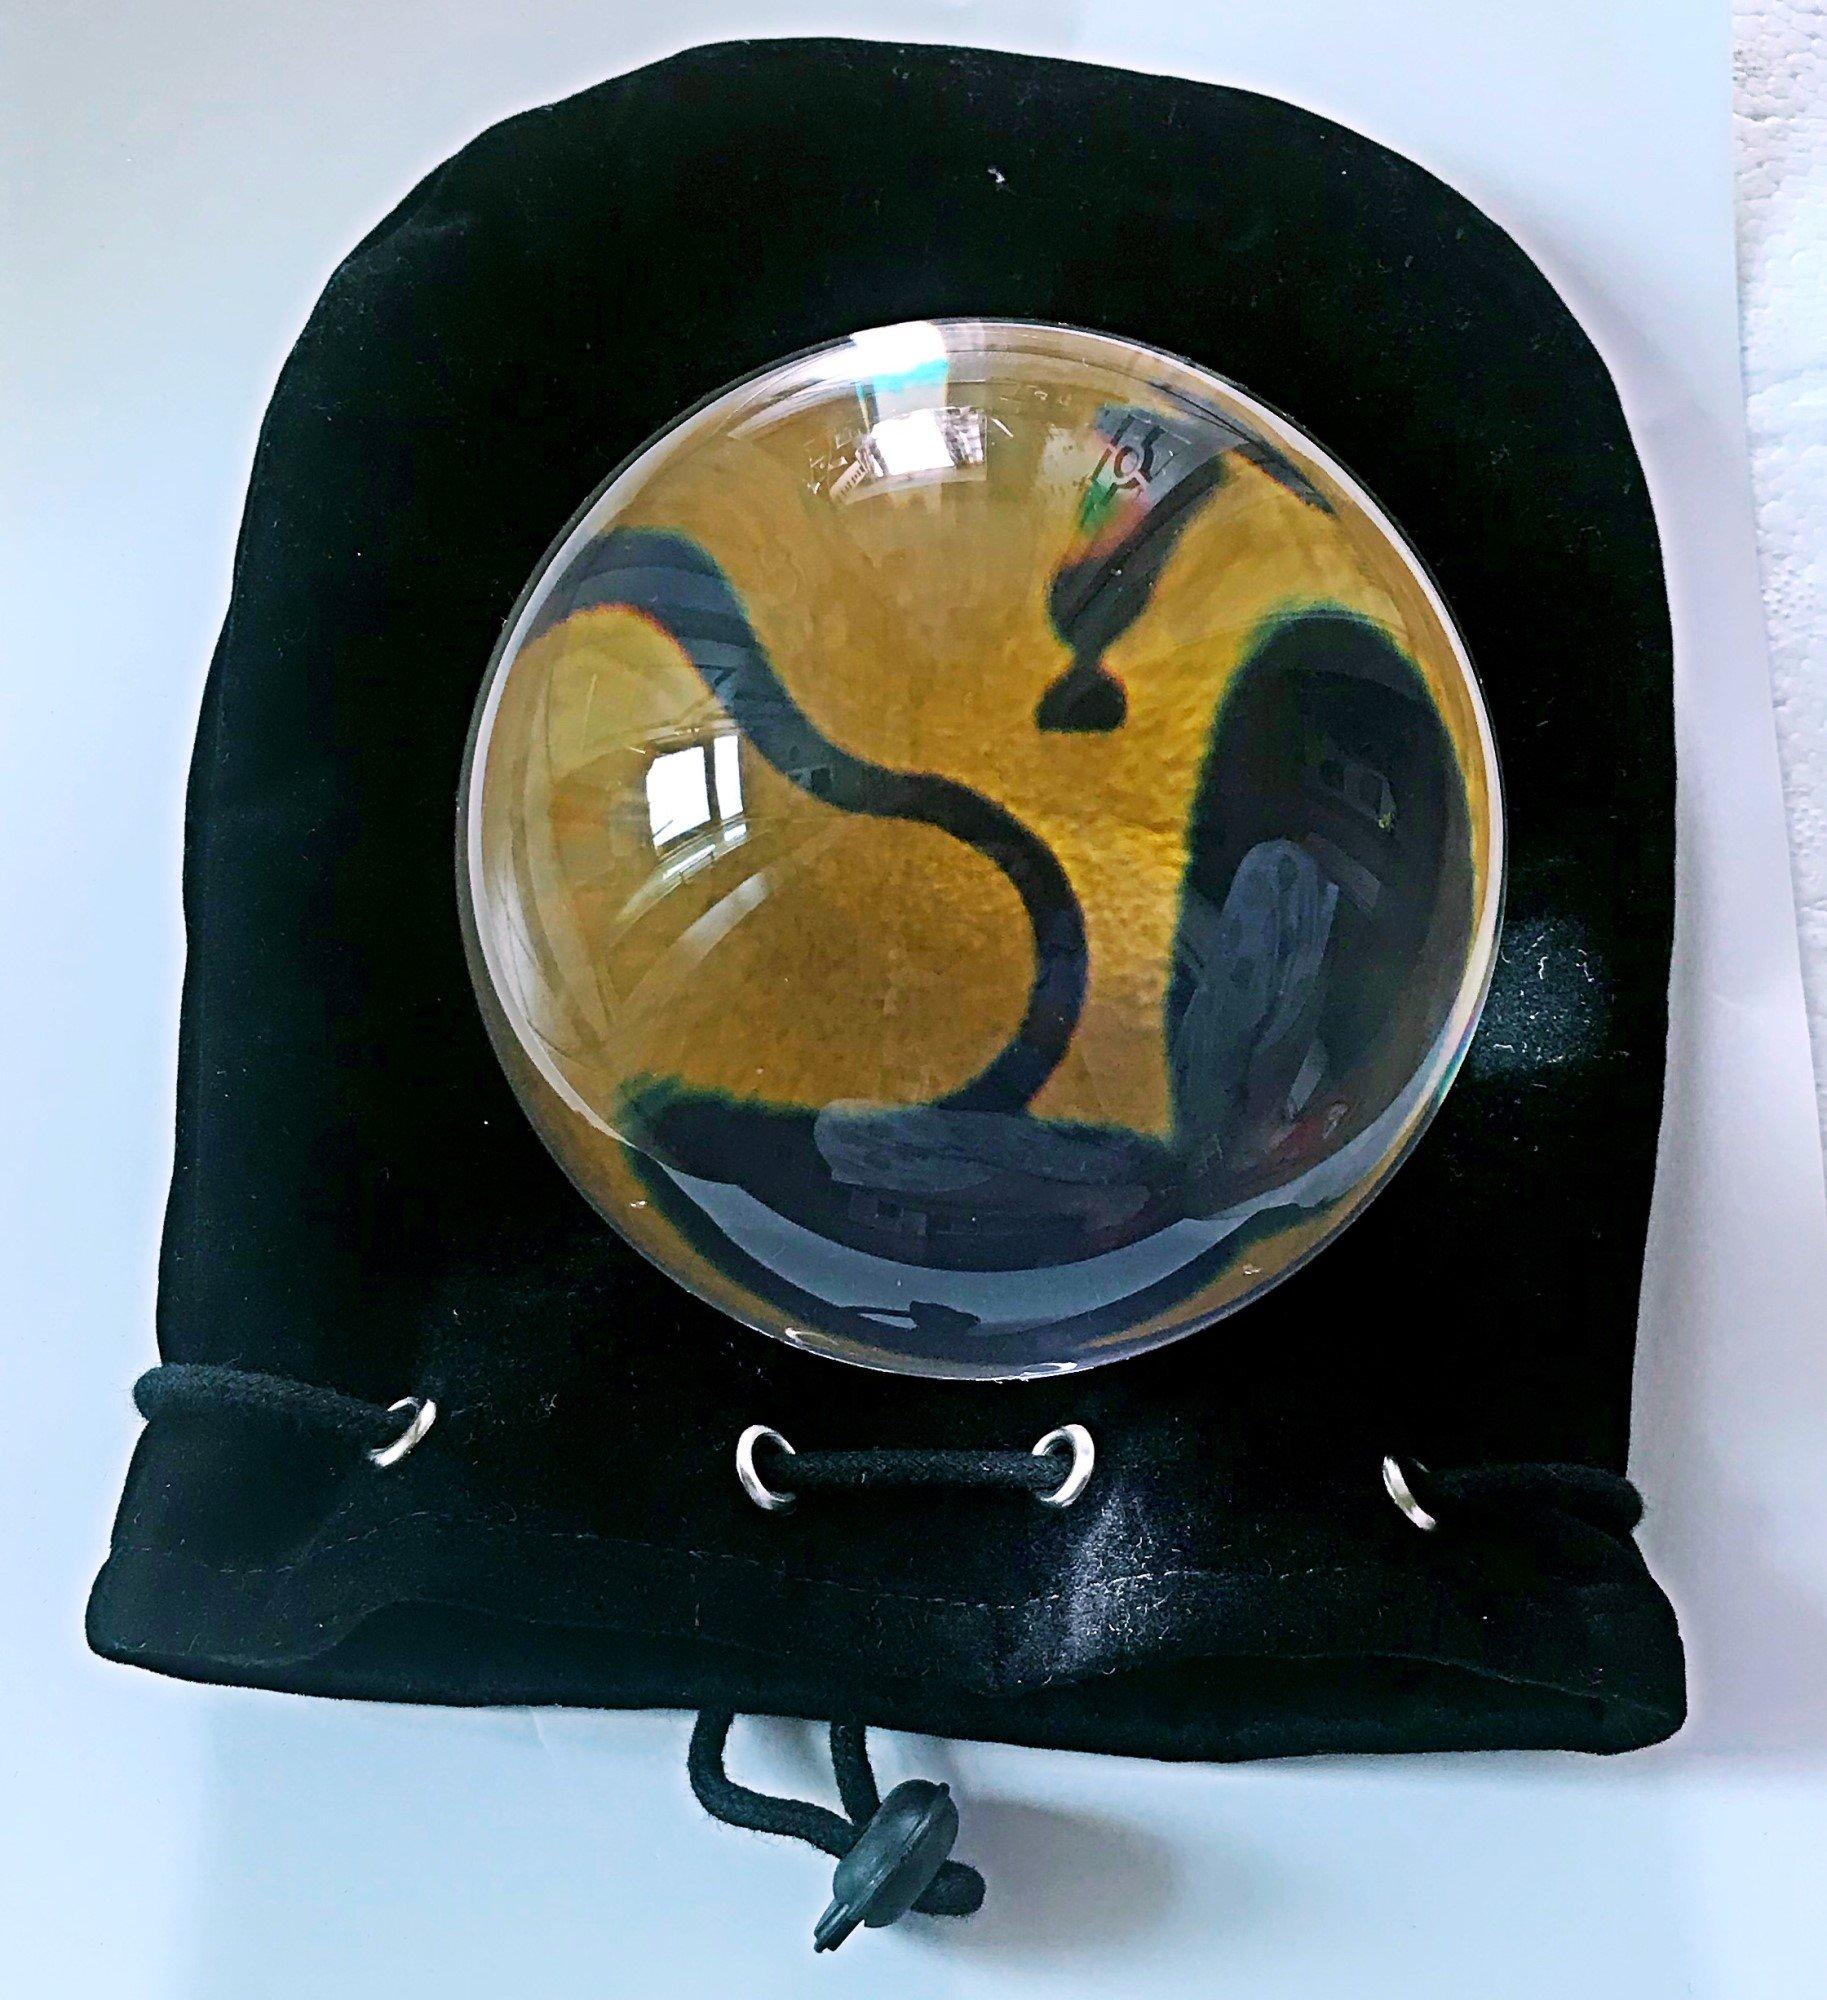 DSJUGGLING Clear UV Acrylic Contact Juggling Ball - 4'' - 100mm by DSJUGGLING (Image #3)